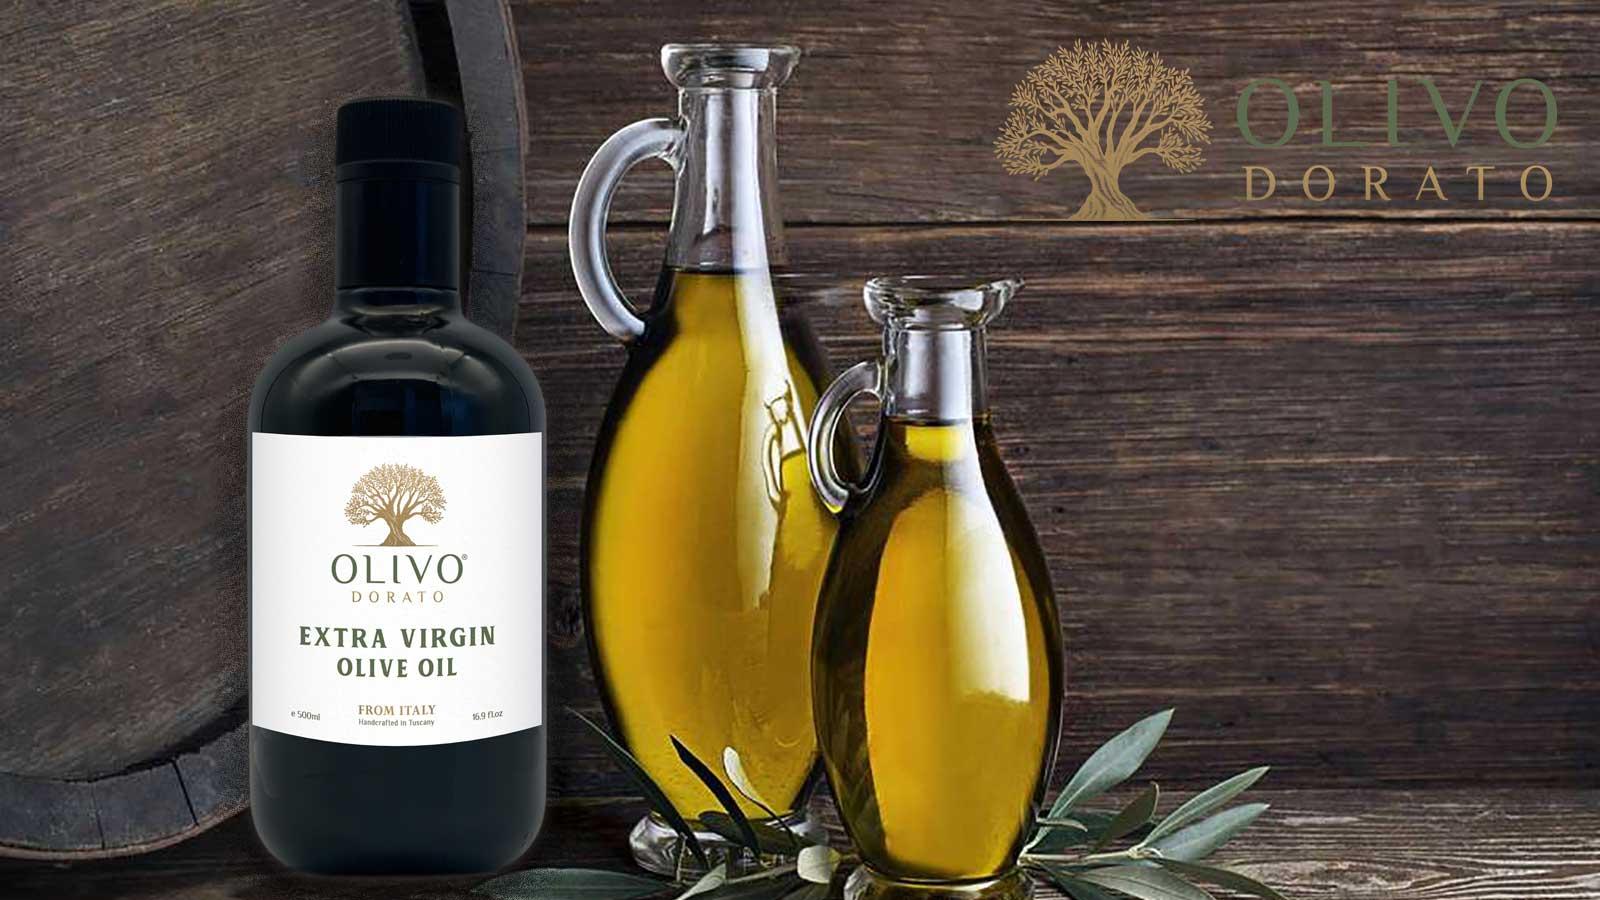 Olivo Dorato ist gutes Olivenöl